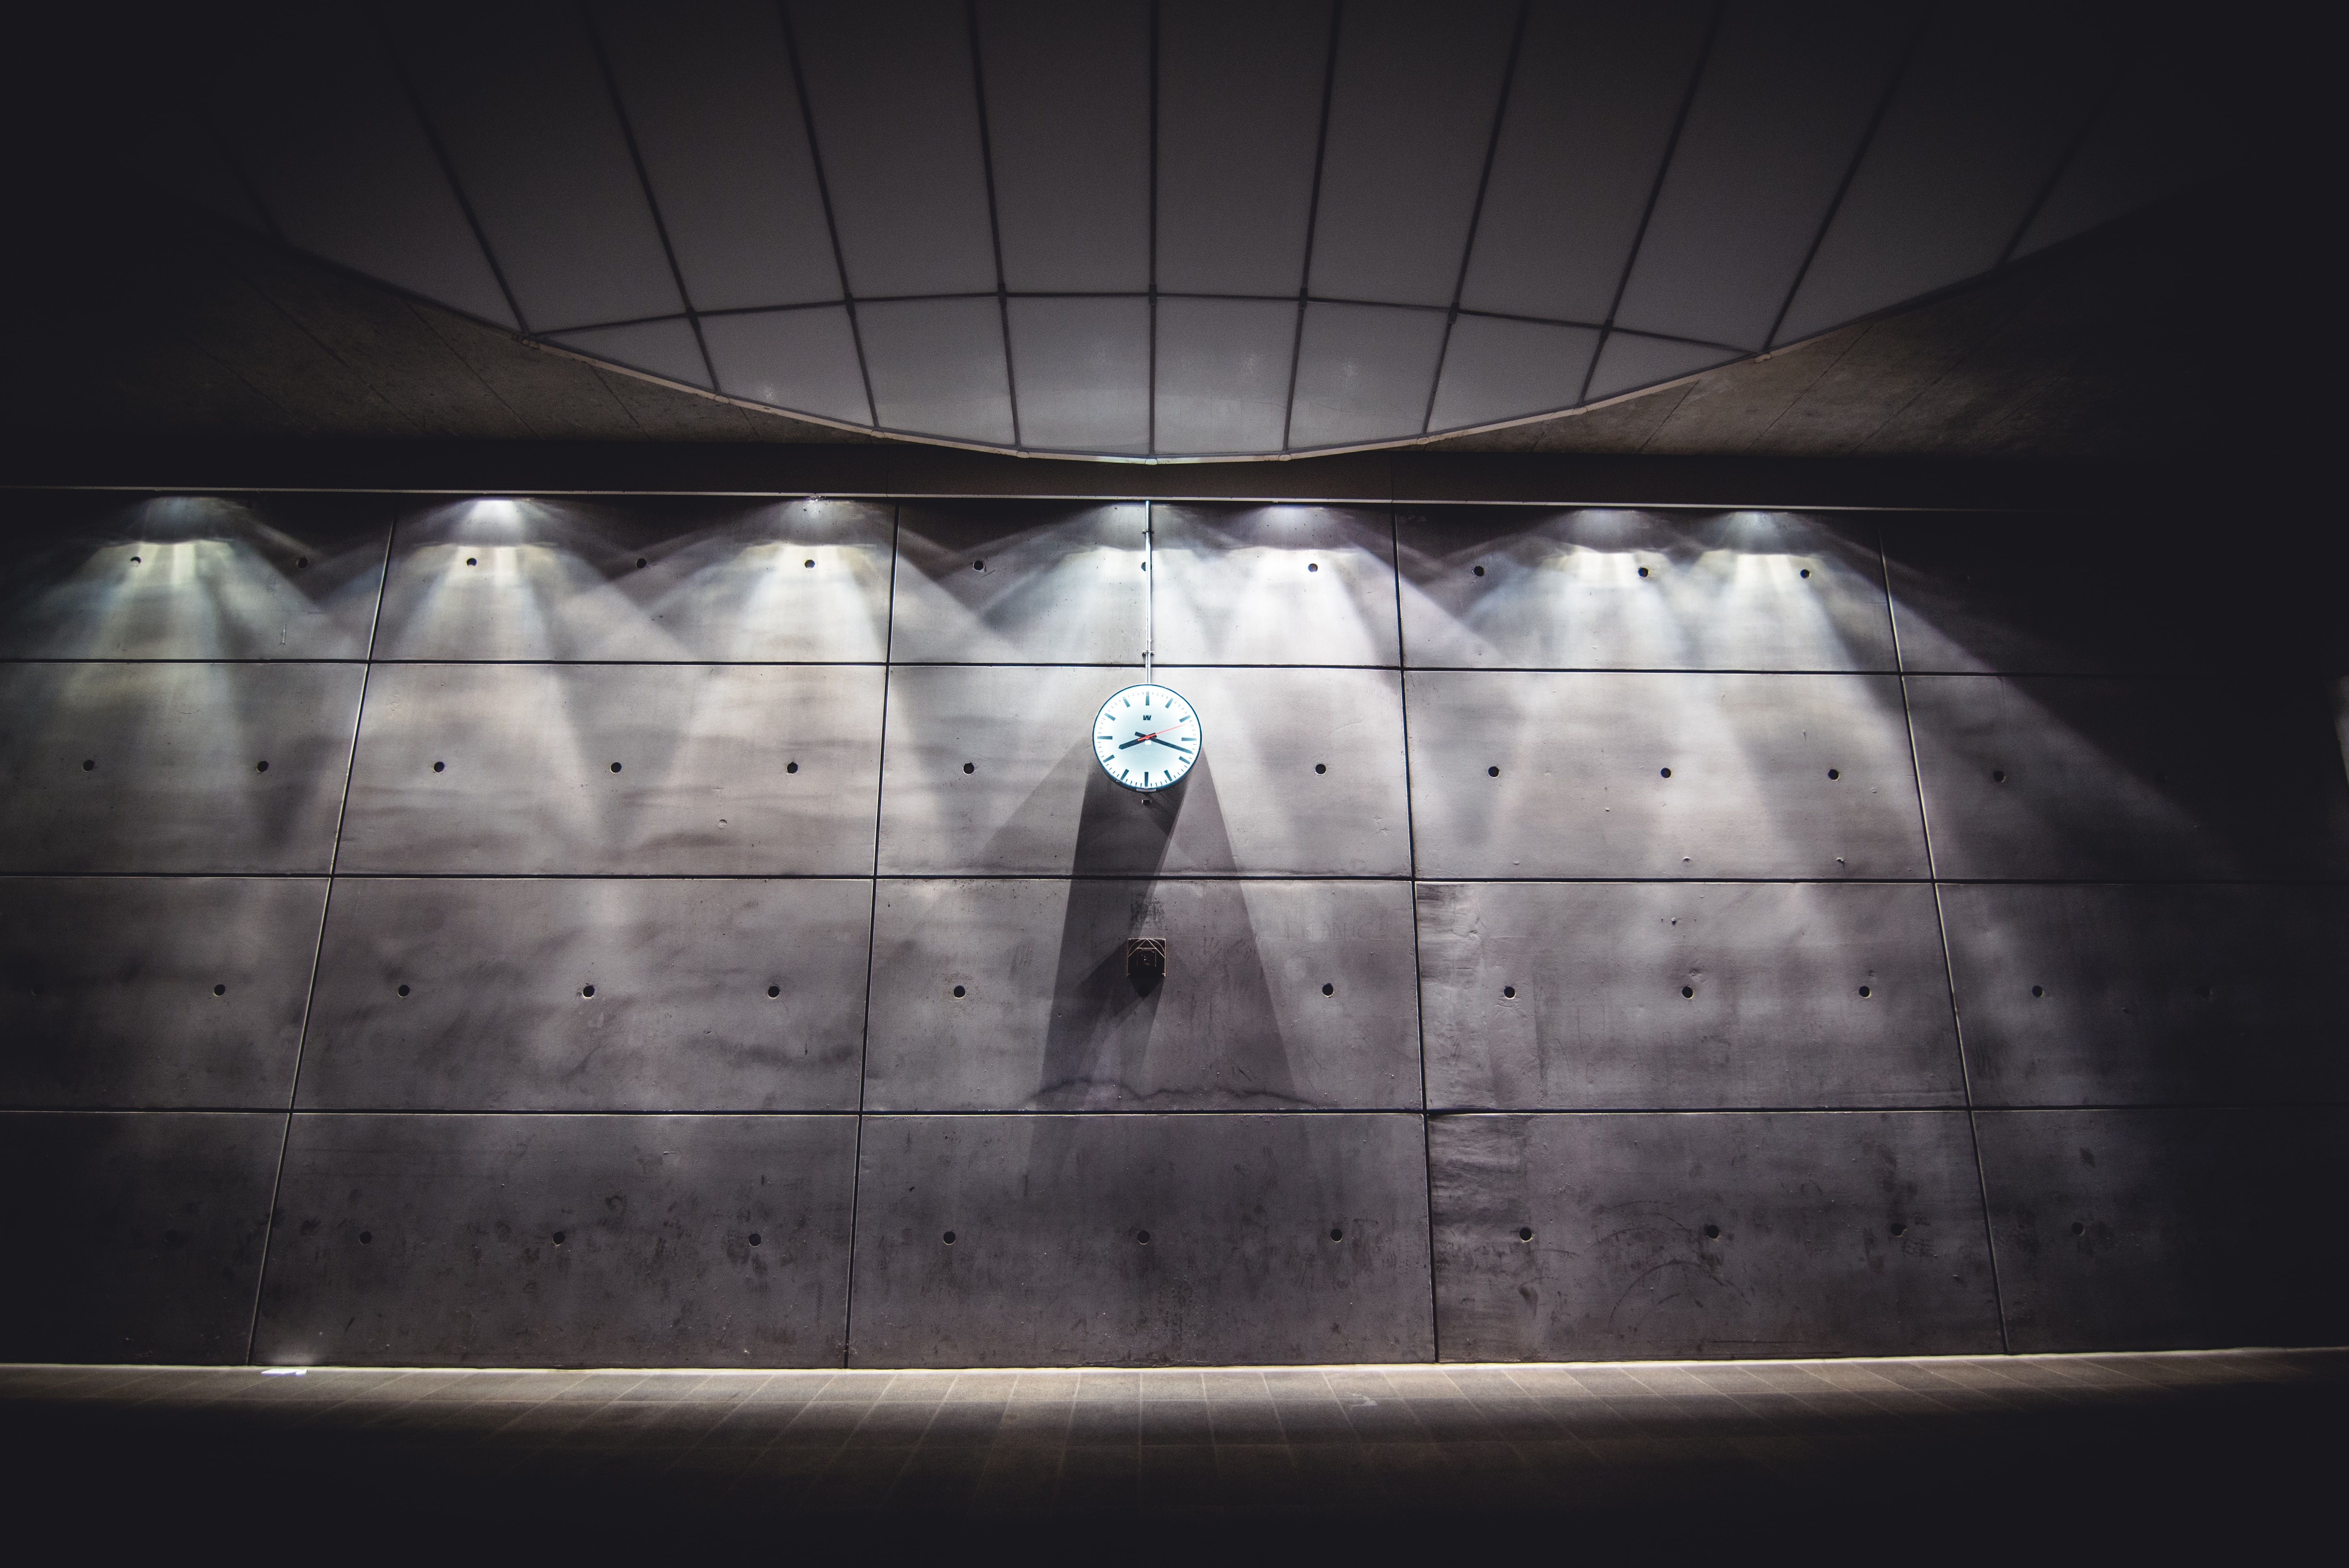 analog clock on wall